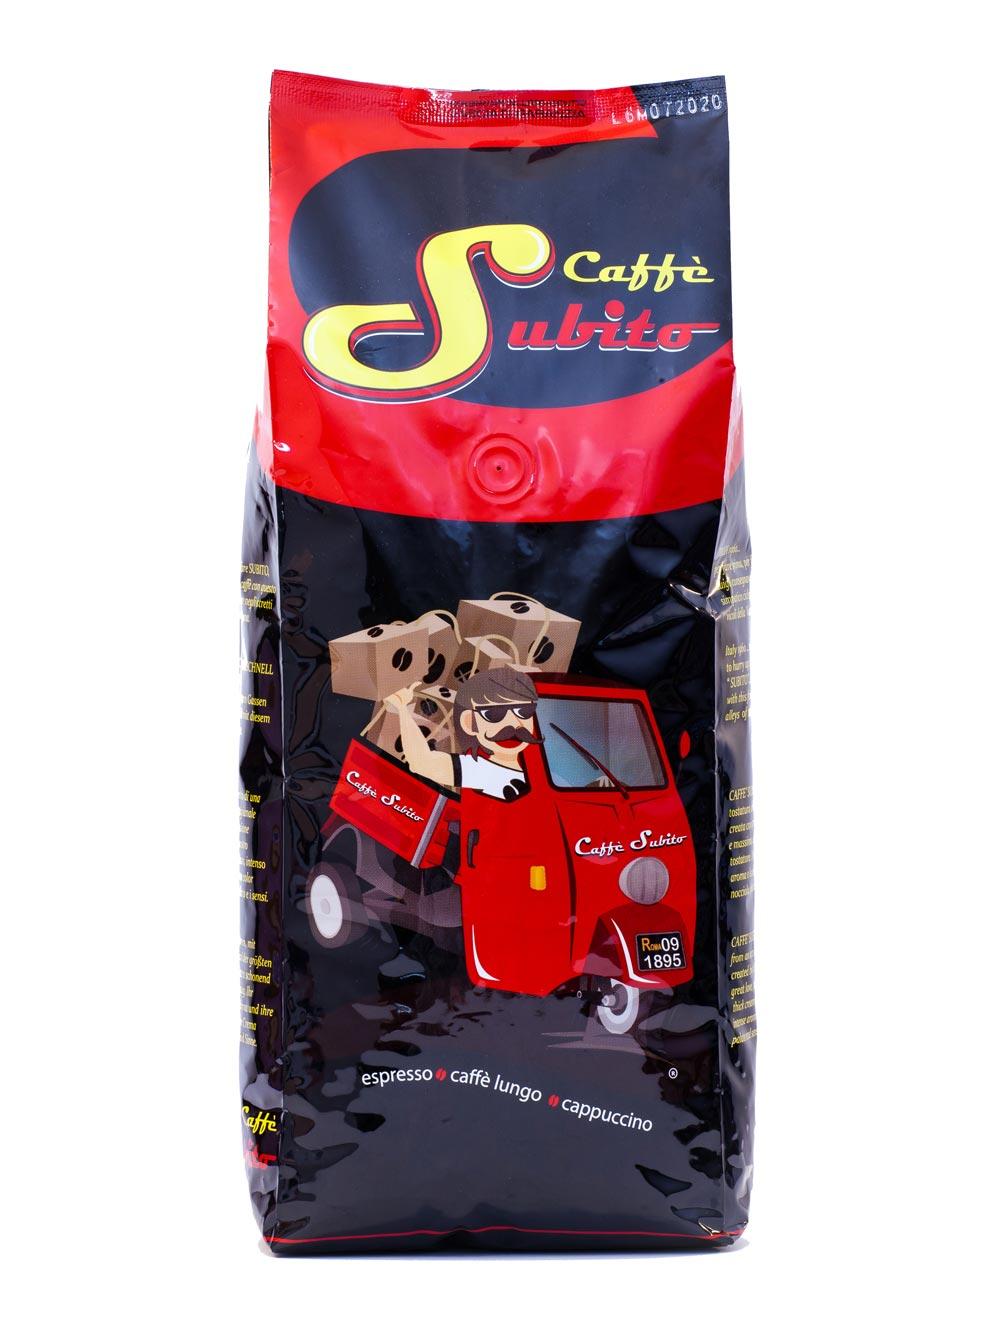 martella kaffee espresso subito bohnen 1000g kaffee in bohnen. Black Bedroom Furniture Sets. Home Design Ideas